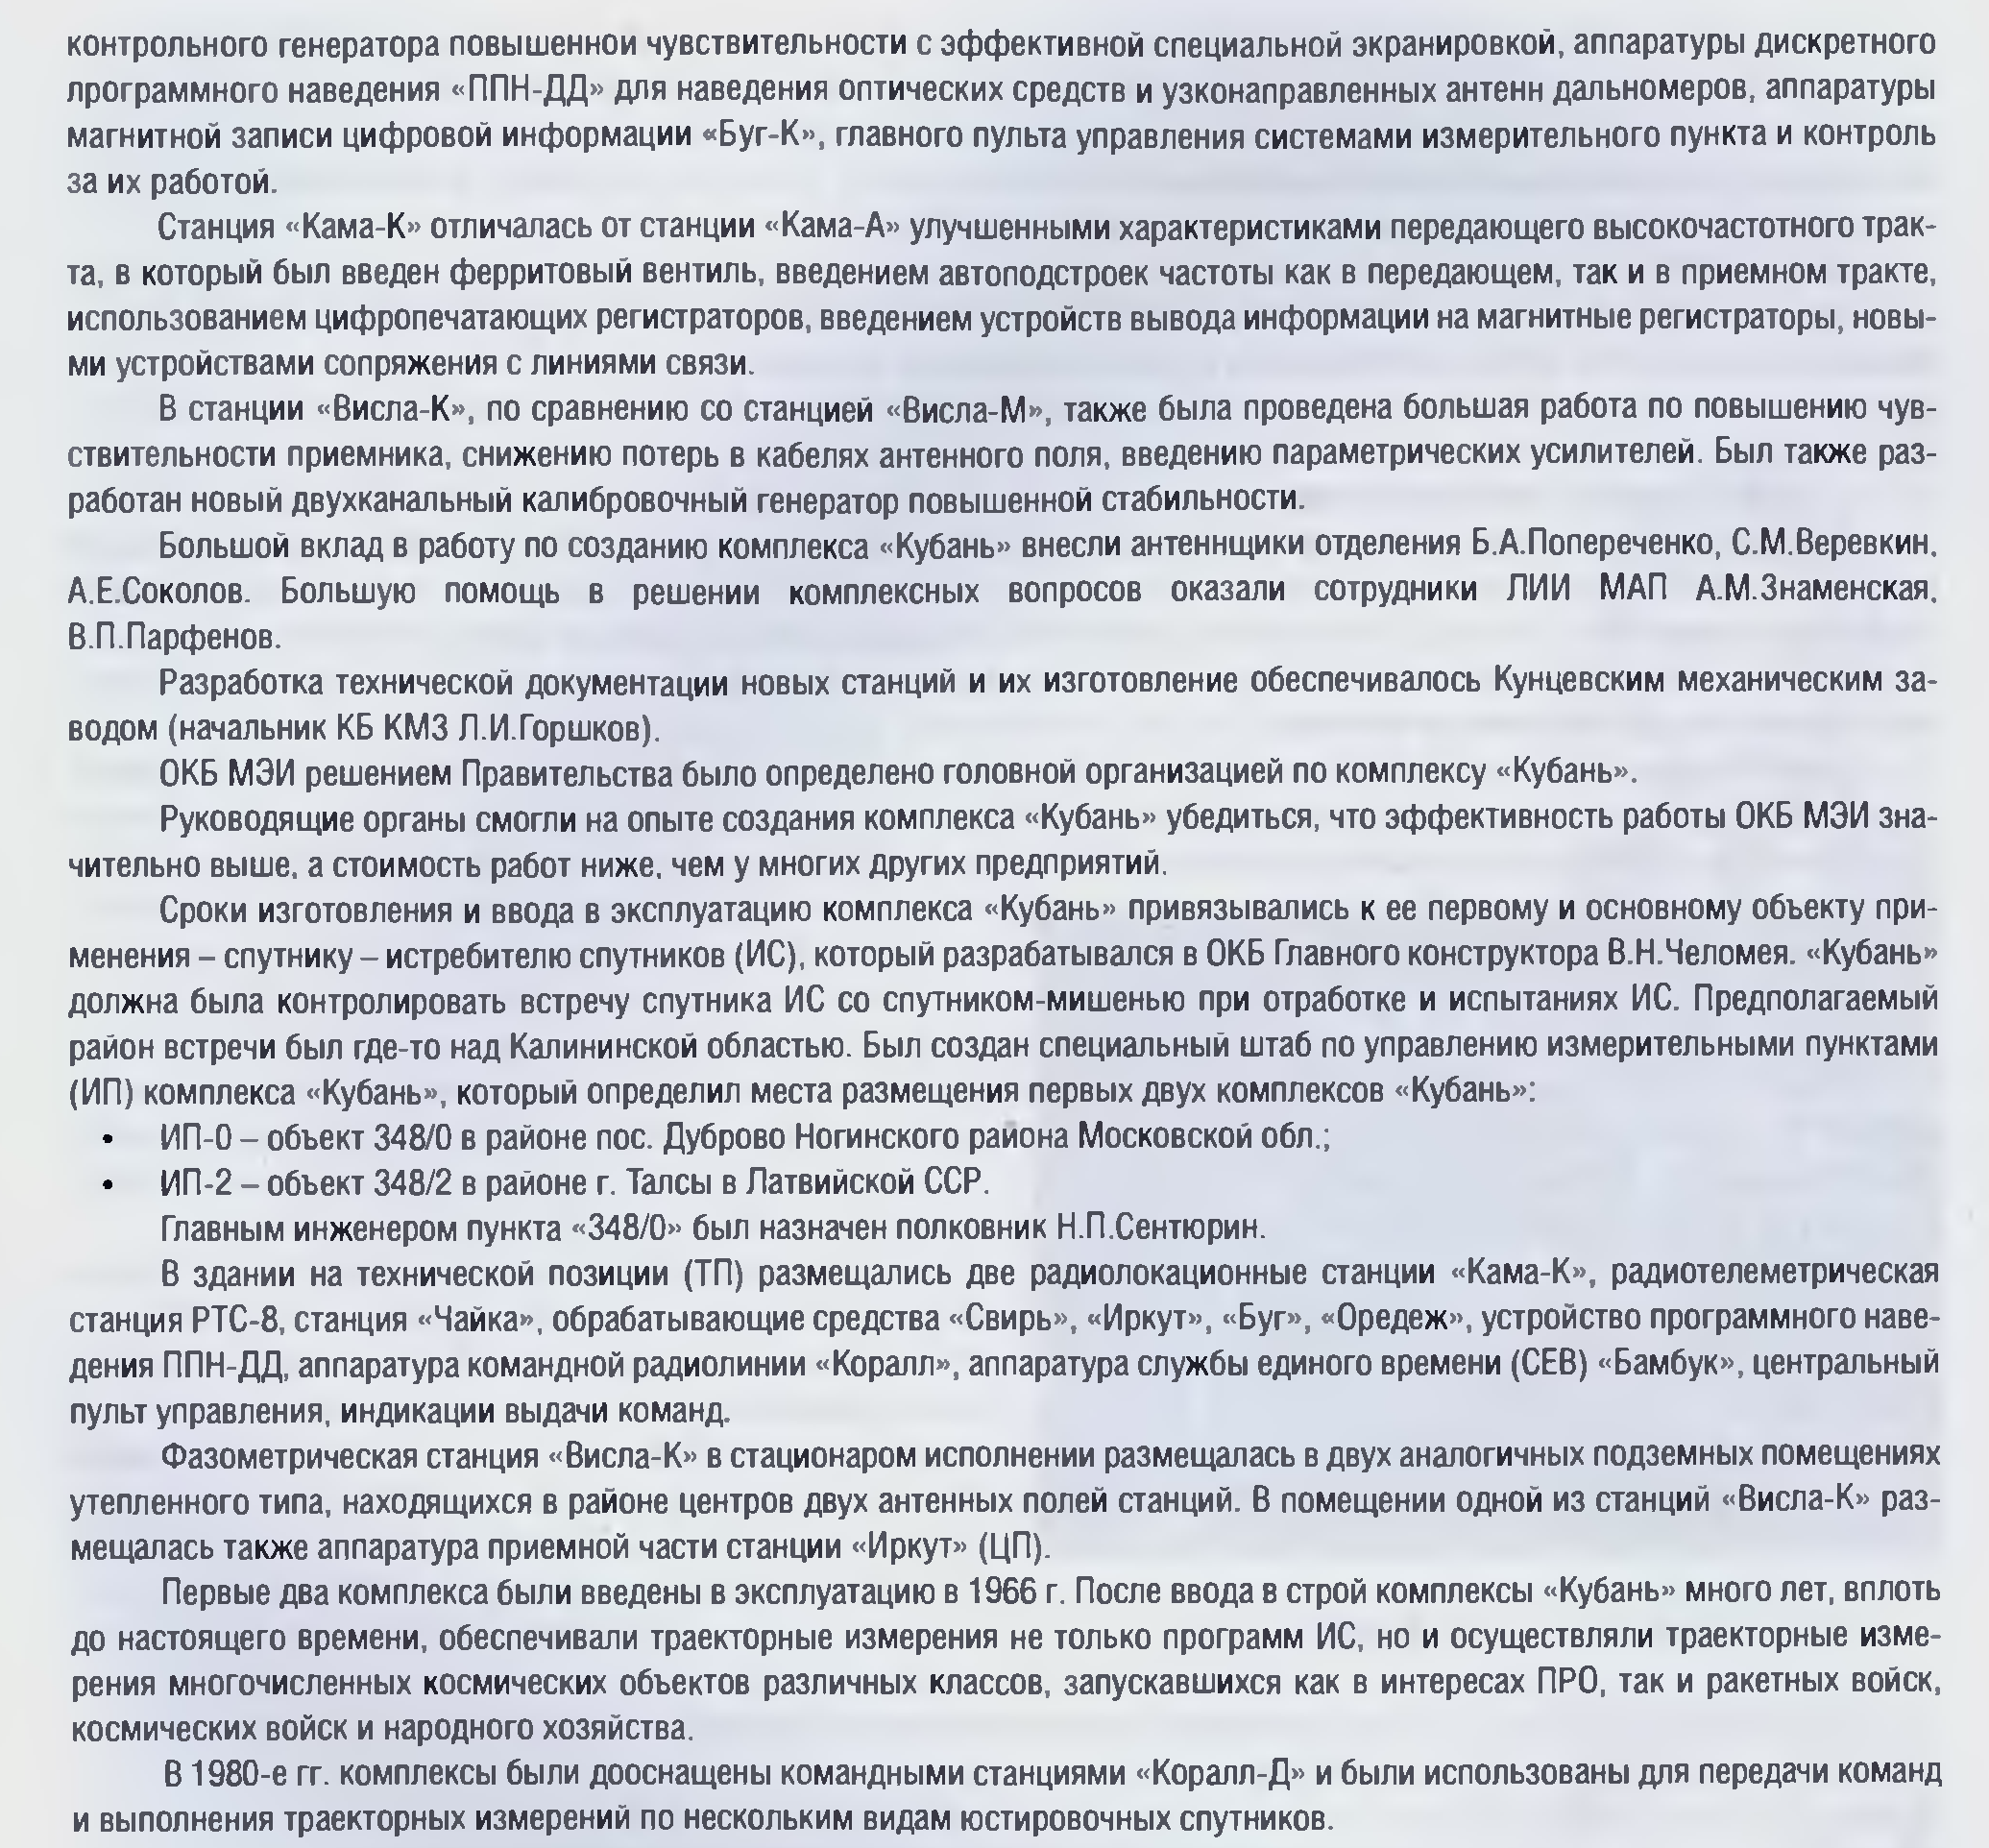 http://images.vfl.ru/ii/1499590791/ad7a08d4/17863501.png